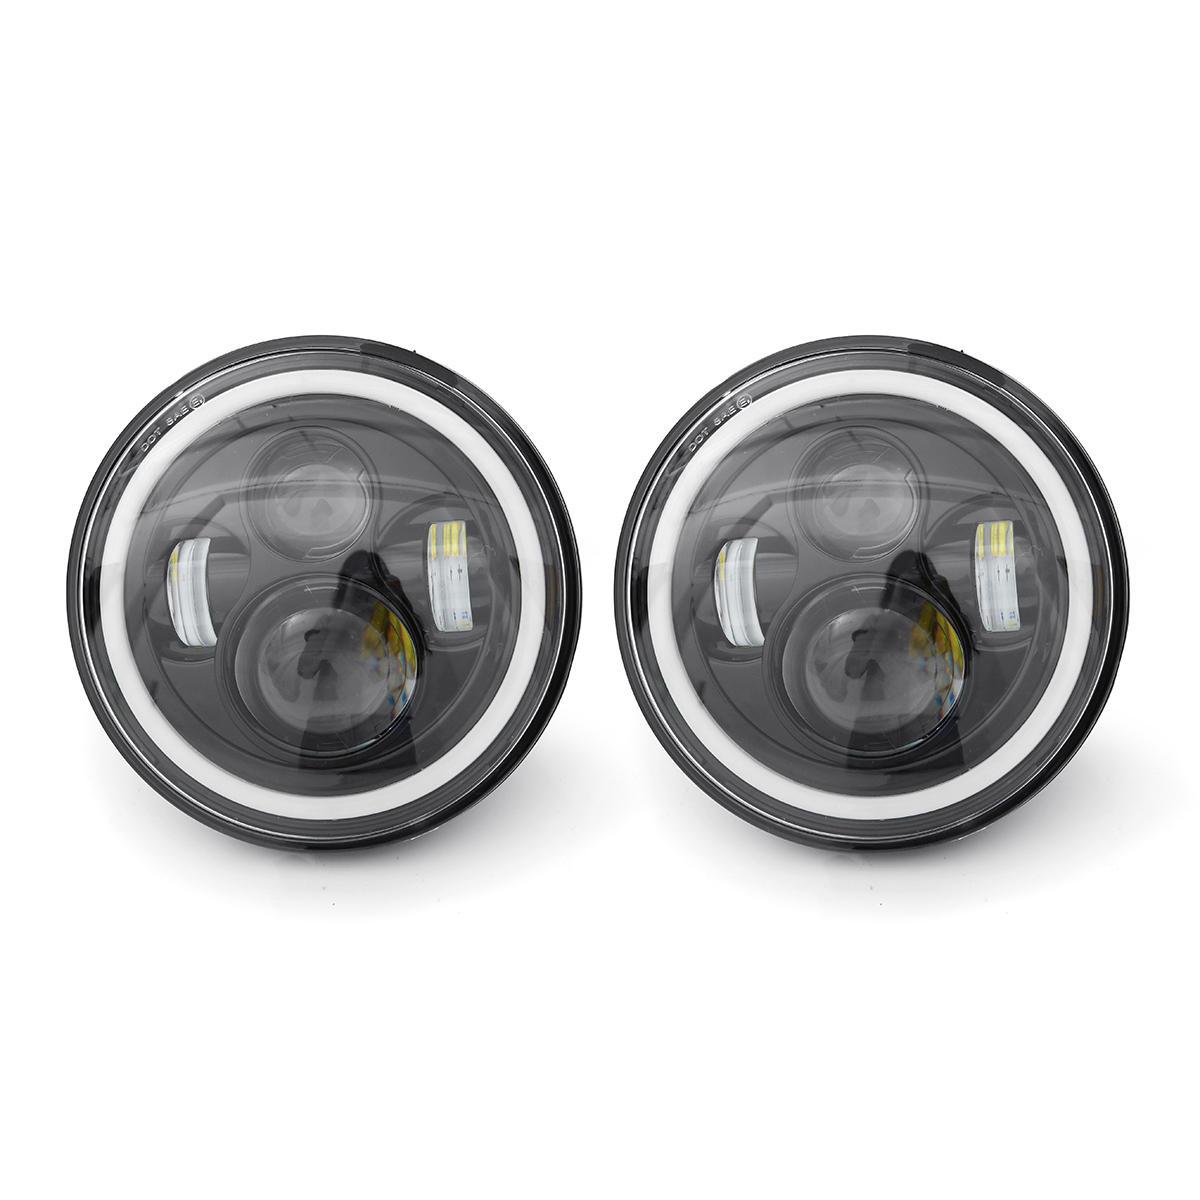 "2pcs 7"" Inch LED Headlights White/Yellow Light Beam Halo Angle Eye For Jeep Wrangler JK TJ LJ"